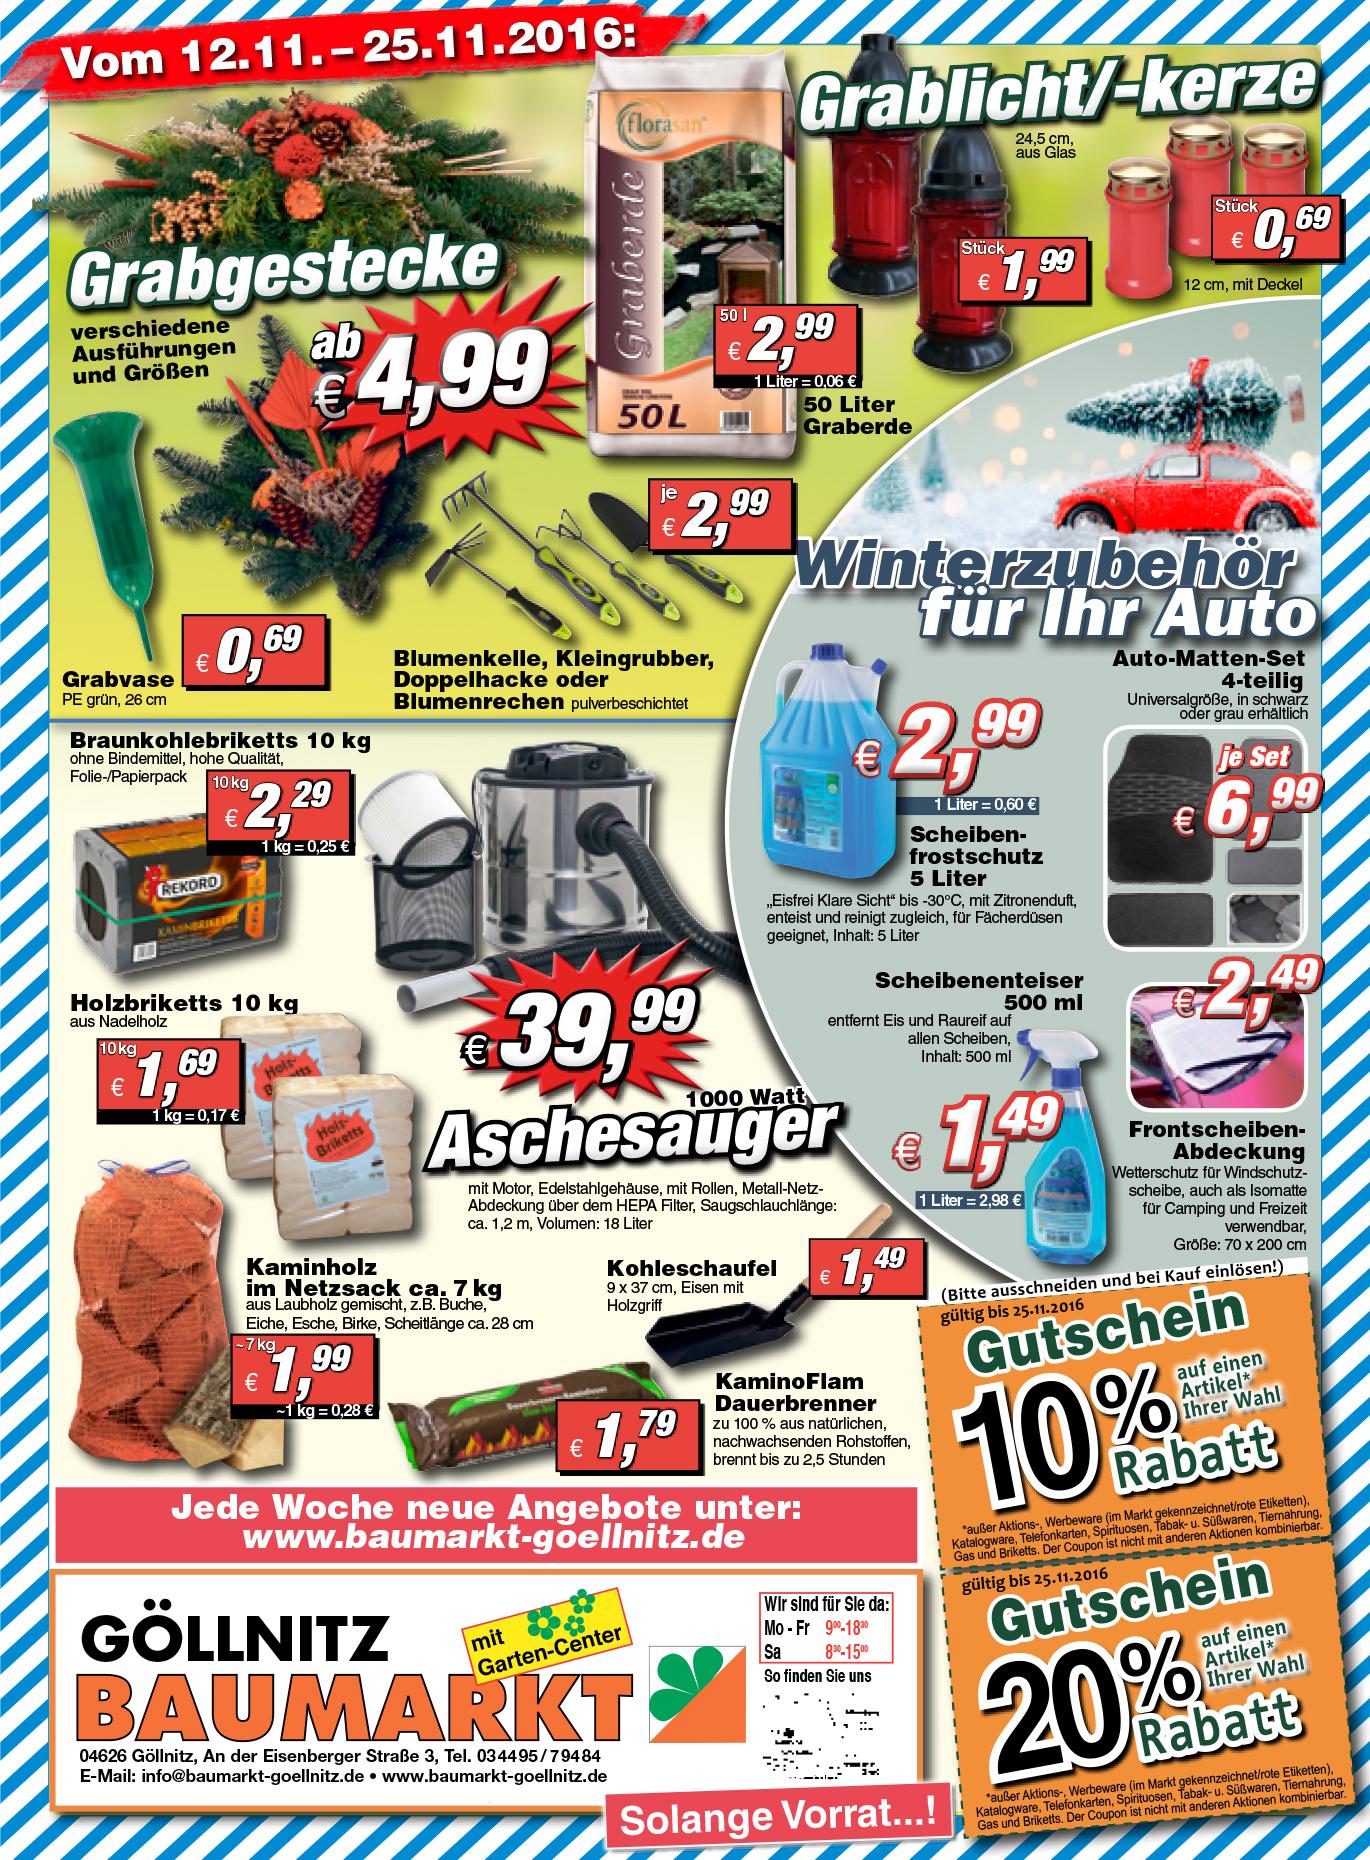 [lokal Göllnitz] 10 Kg Holzbriketts eckig 1,69EUR - [Bundesweit] Preisgarantie Hornbach 1,52 EUR